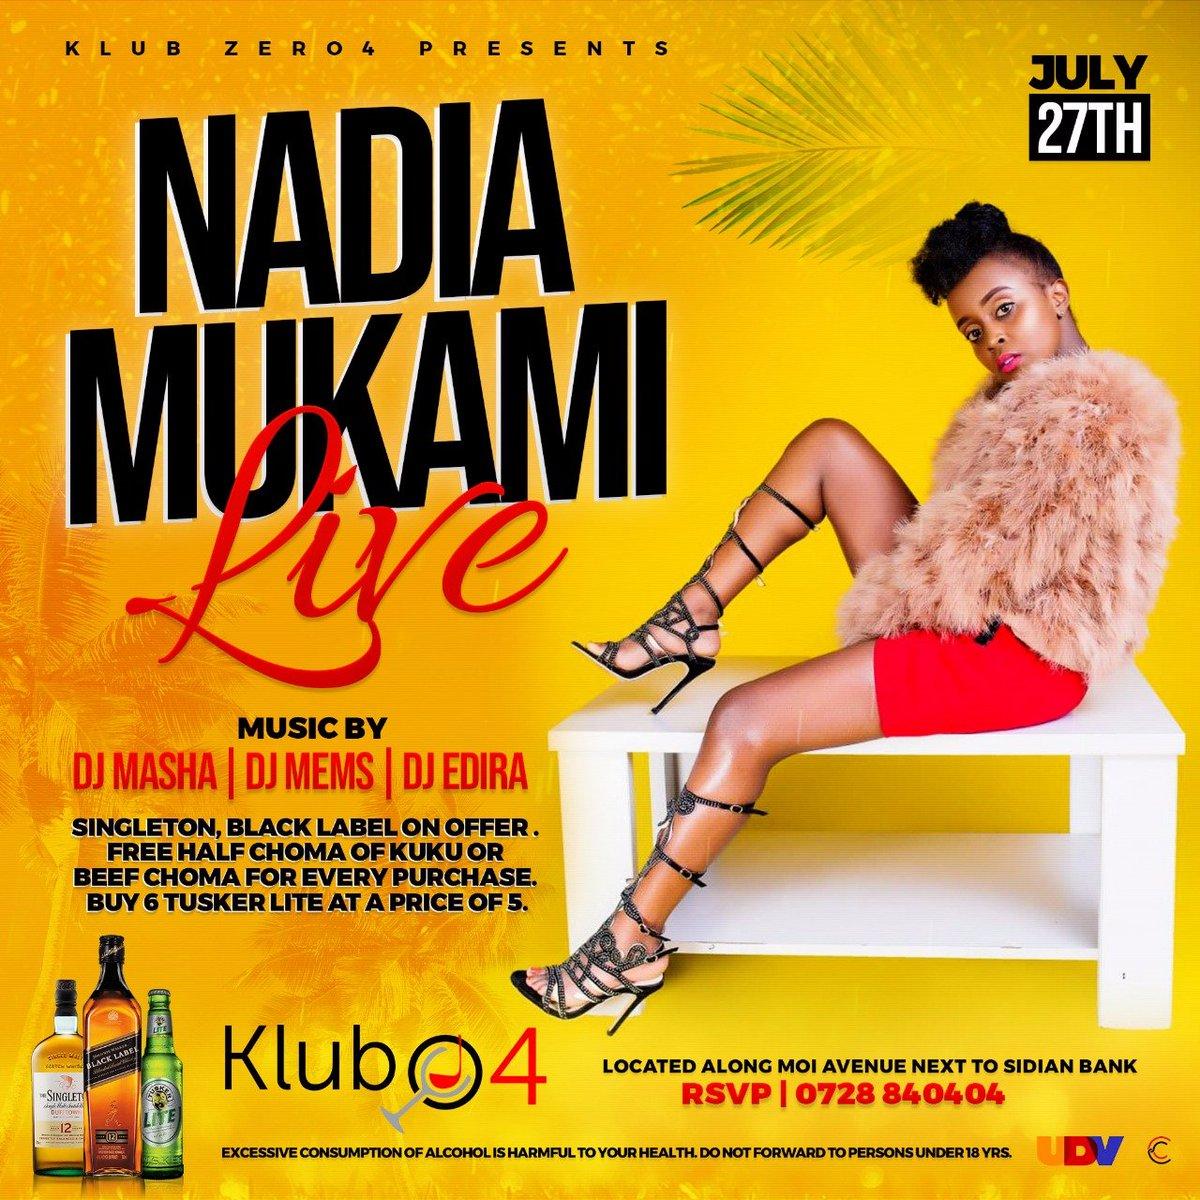 i will be hosting @nadia_mukami next saturday  @klubzero4 mombasa cbd . it will be lit . mark your calendars . #dj #mystyle #thethrillingone #NadiaMukamiLive #gainwithxtiandela #gainwithcarlz #gainpost #gaintrain #gainwithbundi #gainfollowers #mombasa #kenya<br>http://pic.twitter.com/jpHQiSShQQ